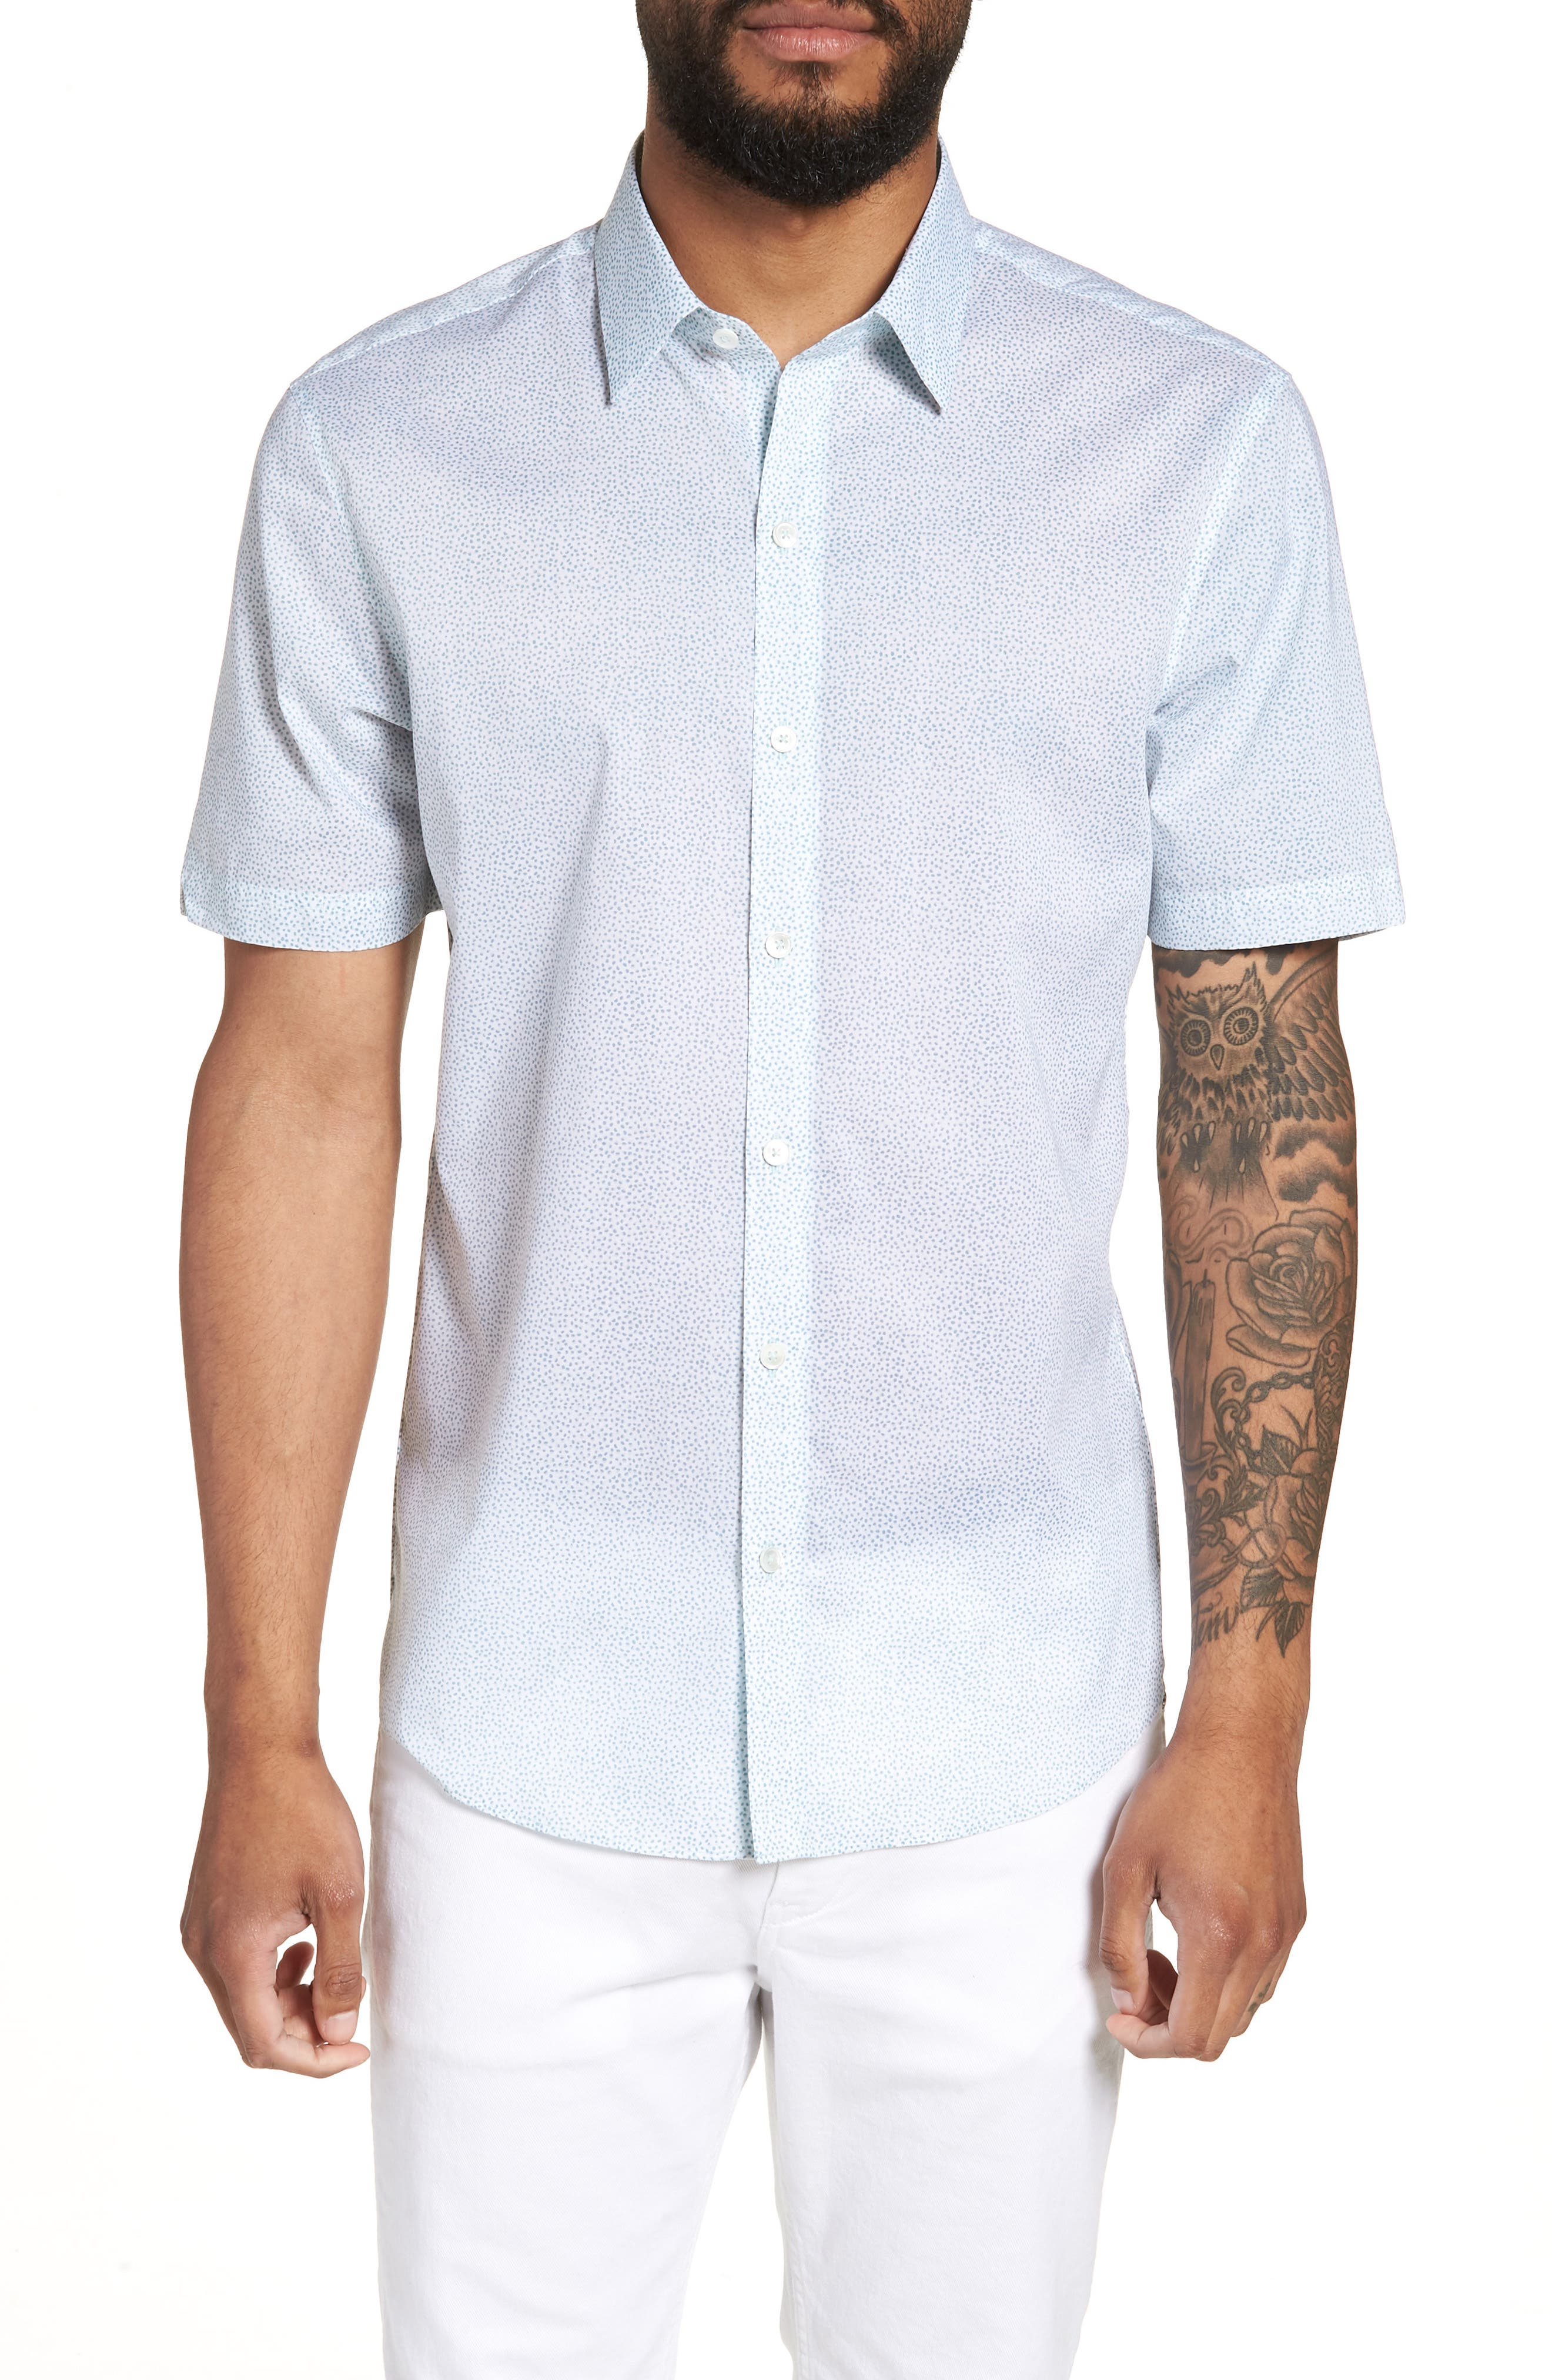 Fung Regular Fit Sport Shirt,                             Main thumbnail 1, color,                             WHITE